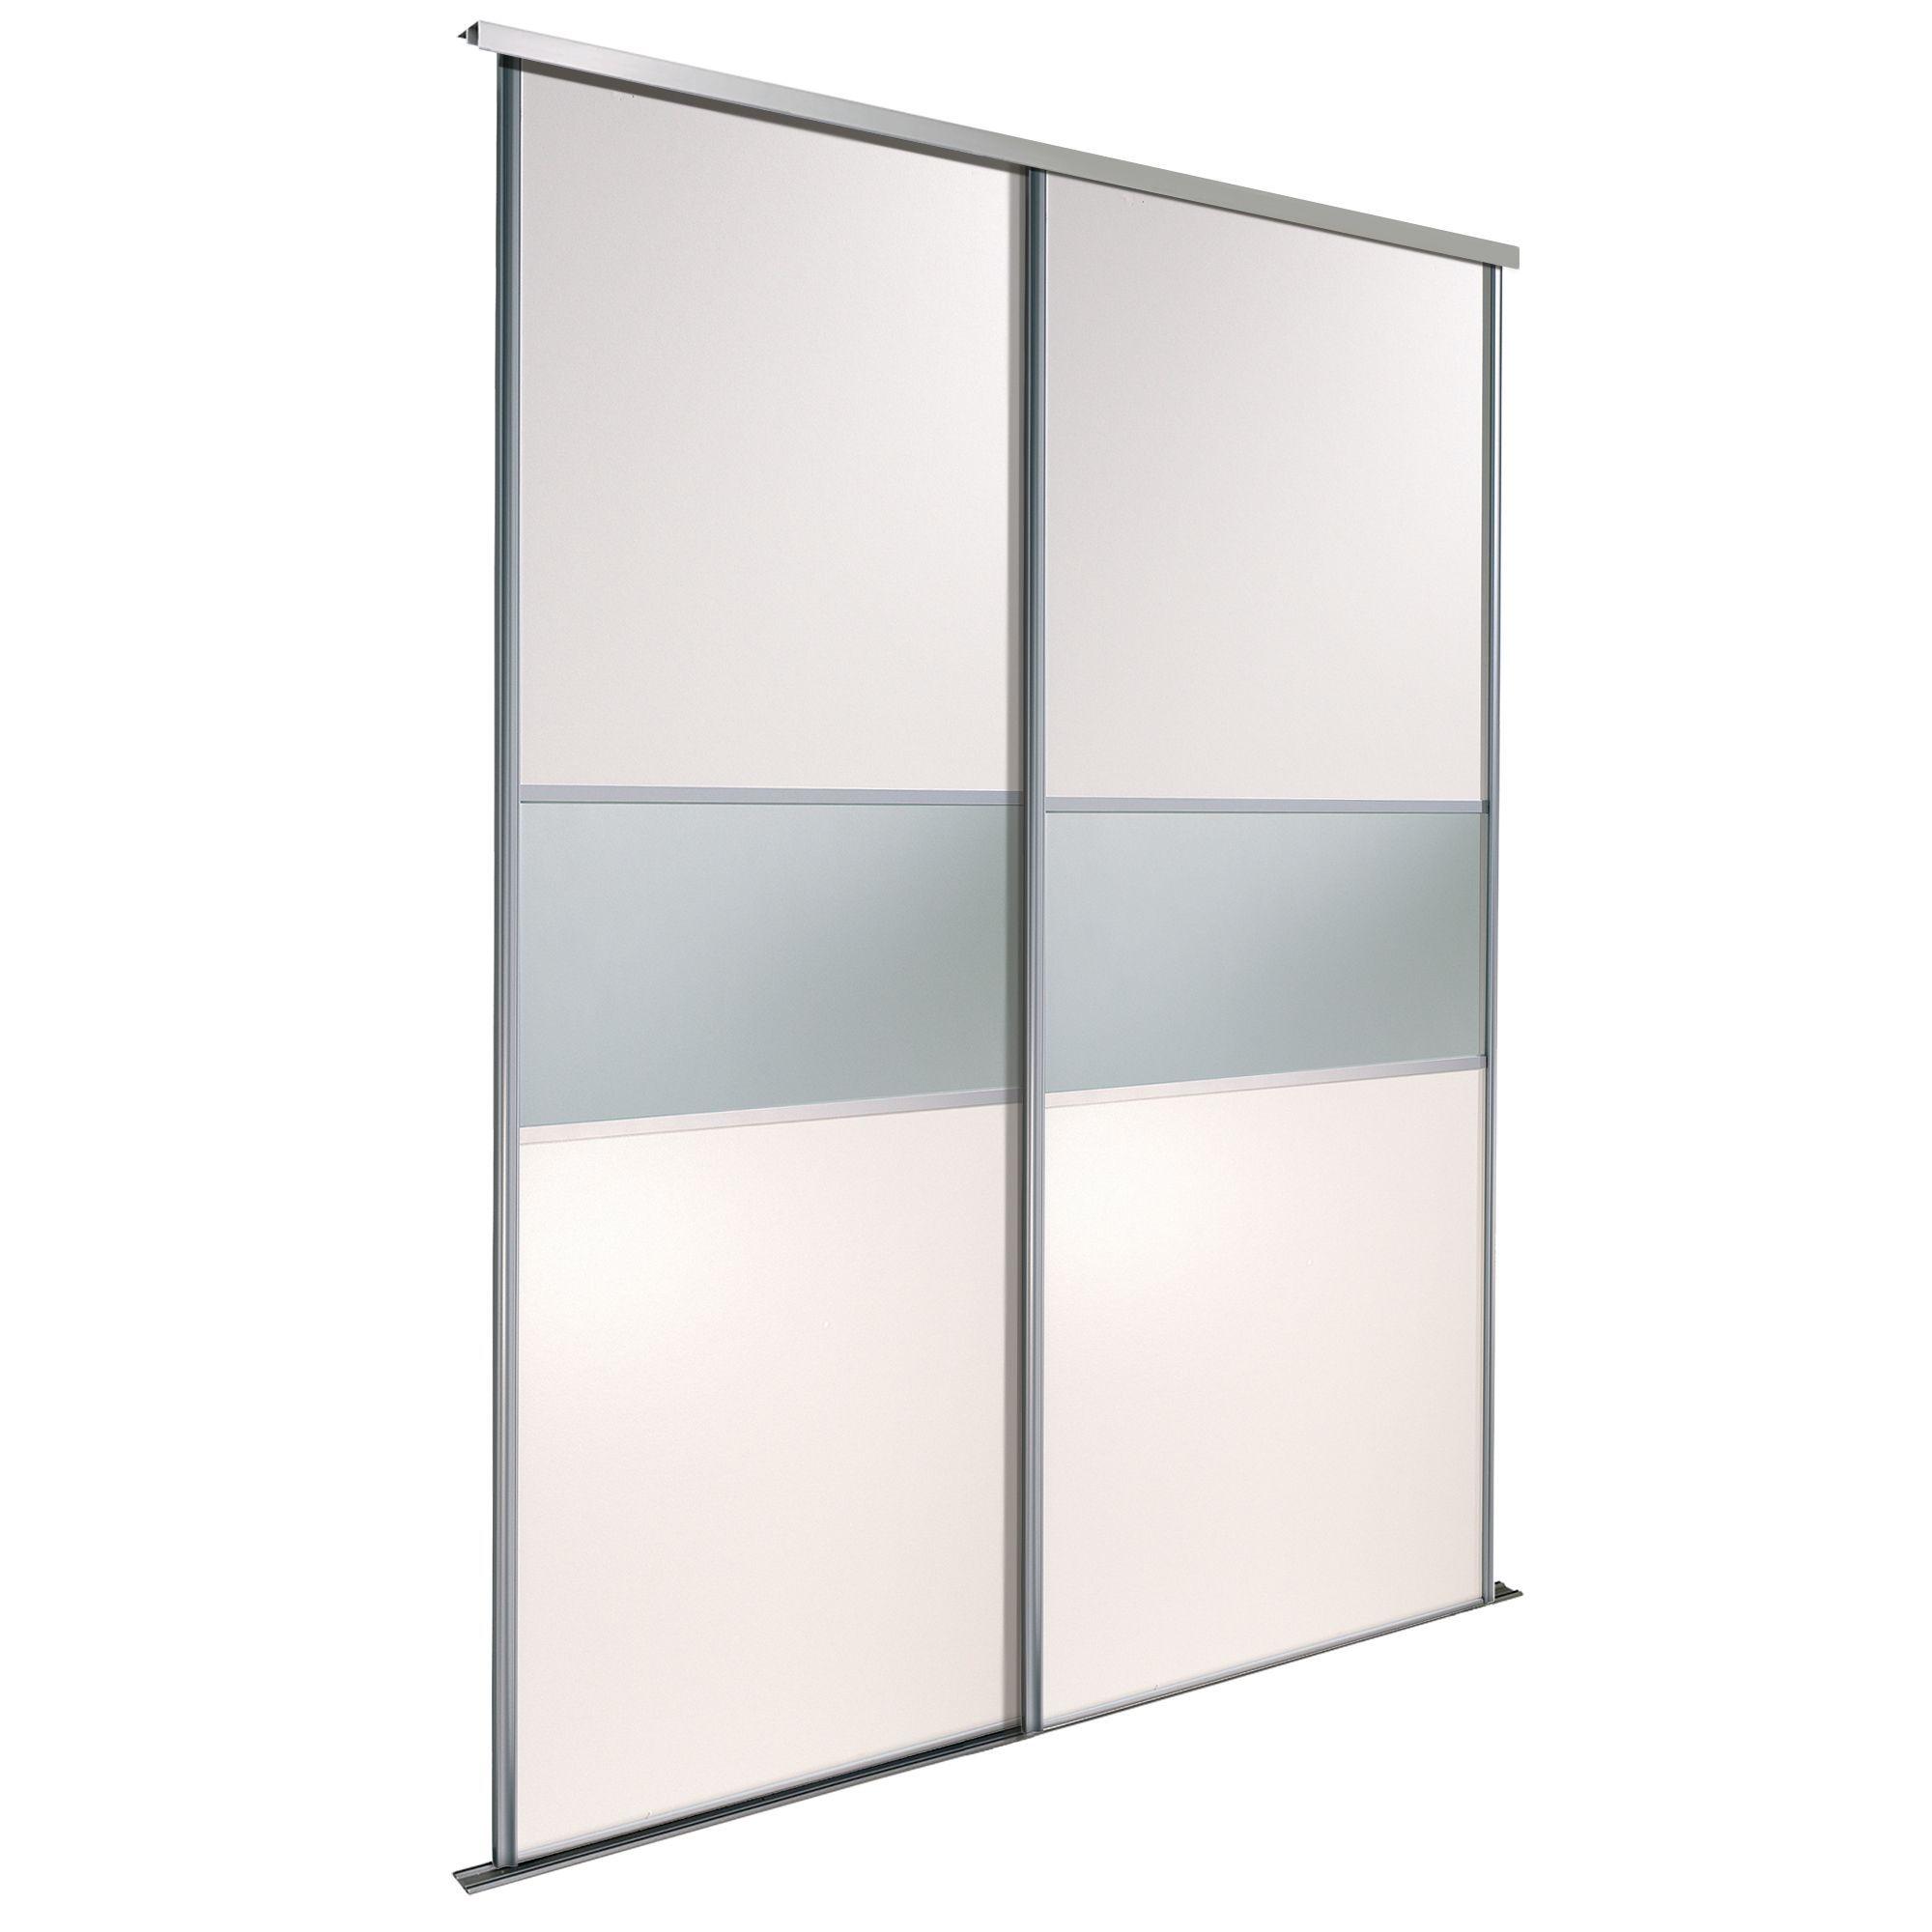 Fineline Fineline White Mirror Sliding Wardrobe Door Kit (H)2220 mm (W)610mm Pack of 2 | Departments | DIY at B\u0026Q  sc 1 st  B\u0026Q & Fineline Fineline White Mirror Sliding Wardrobe Door Kit (H)2220 mm ...